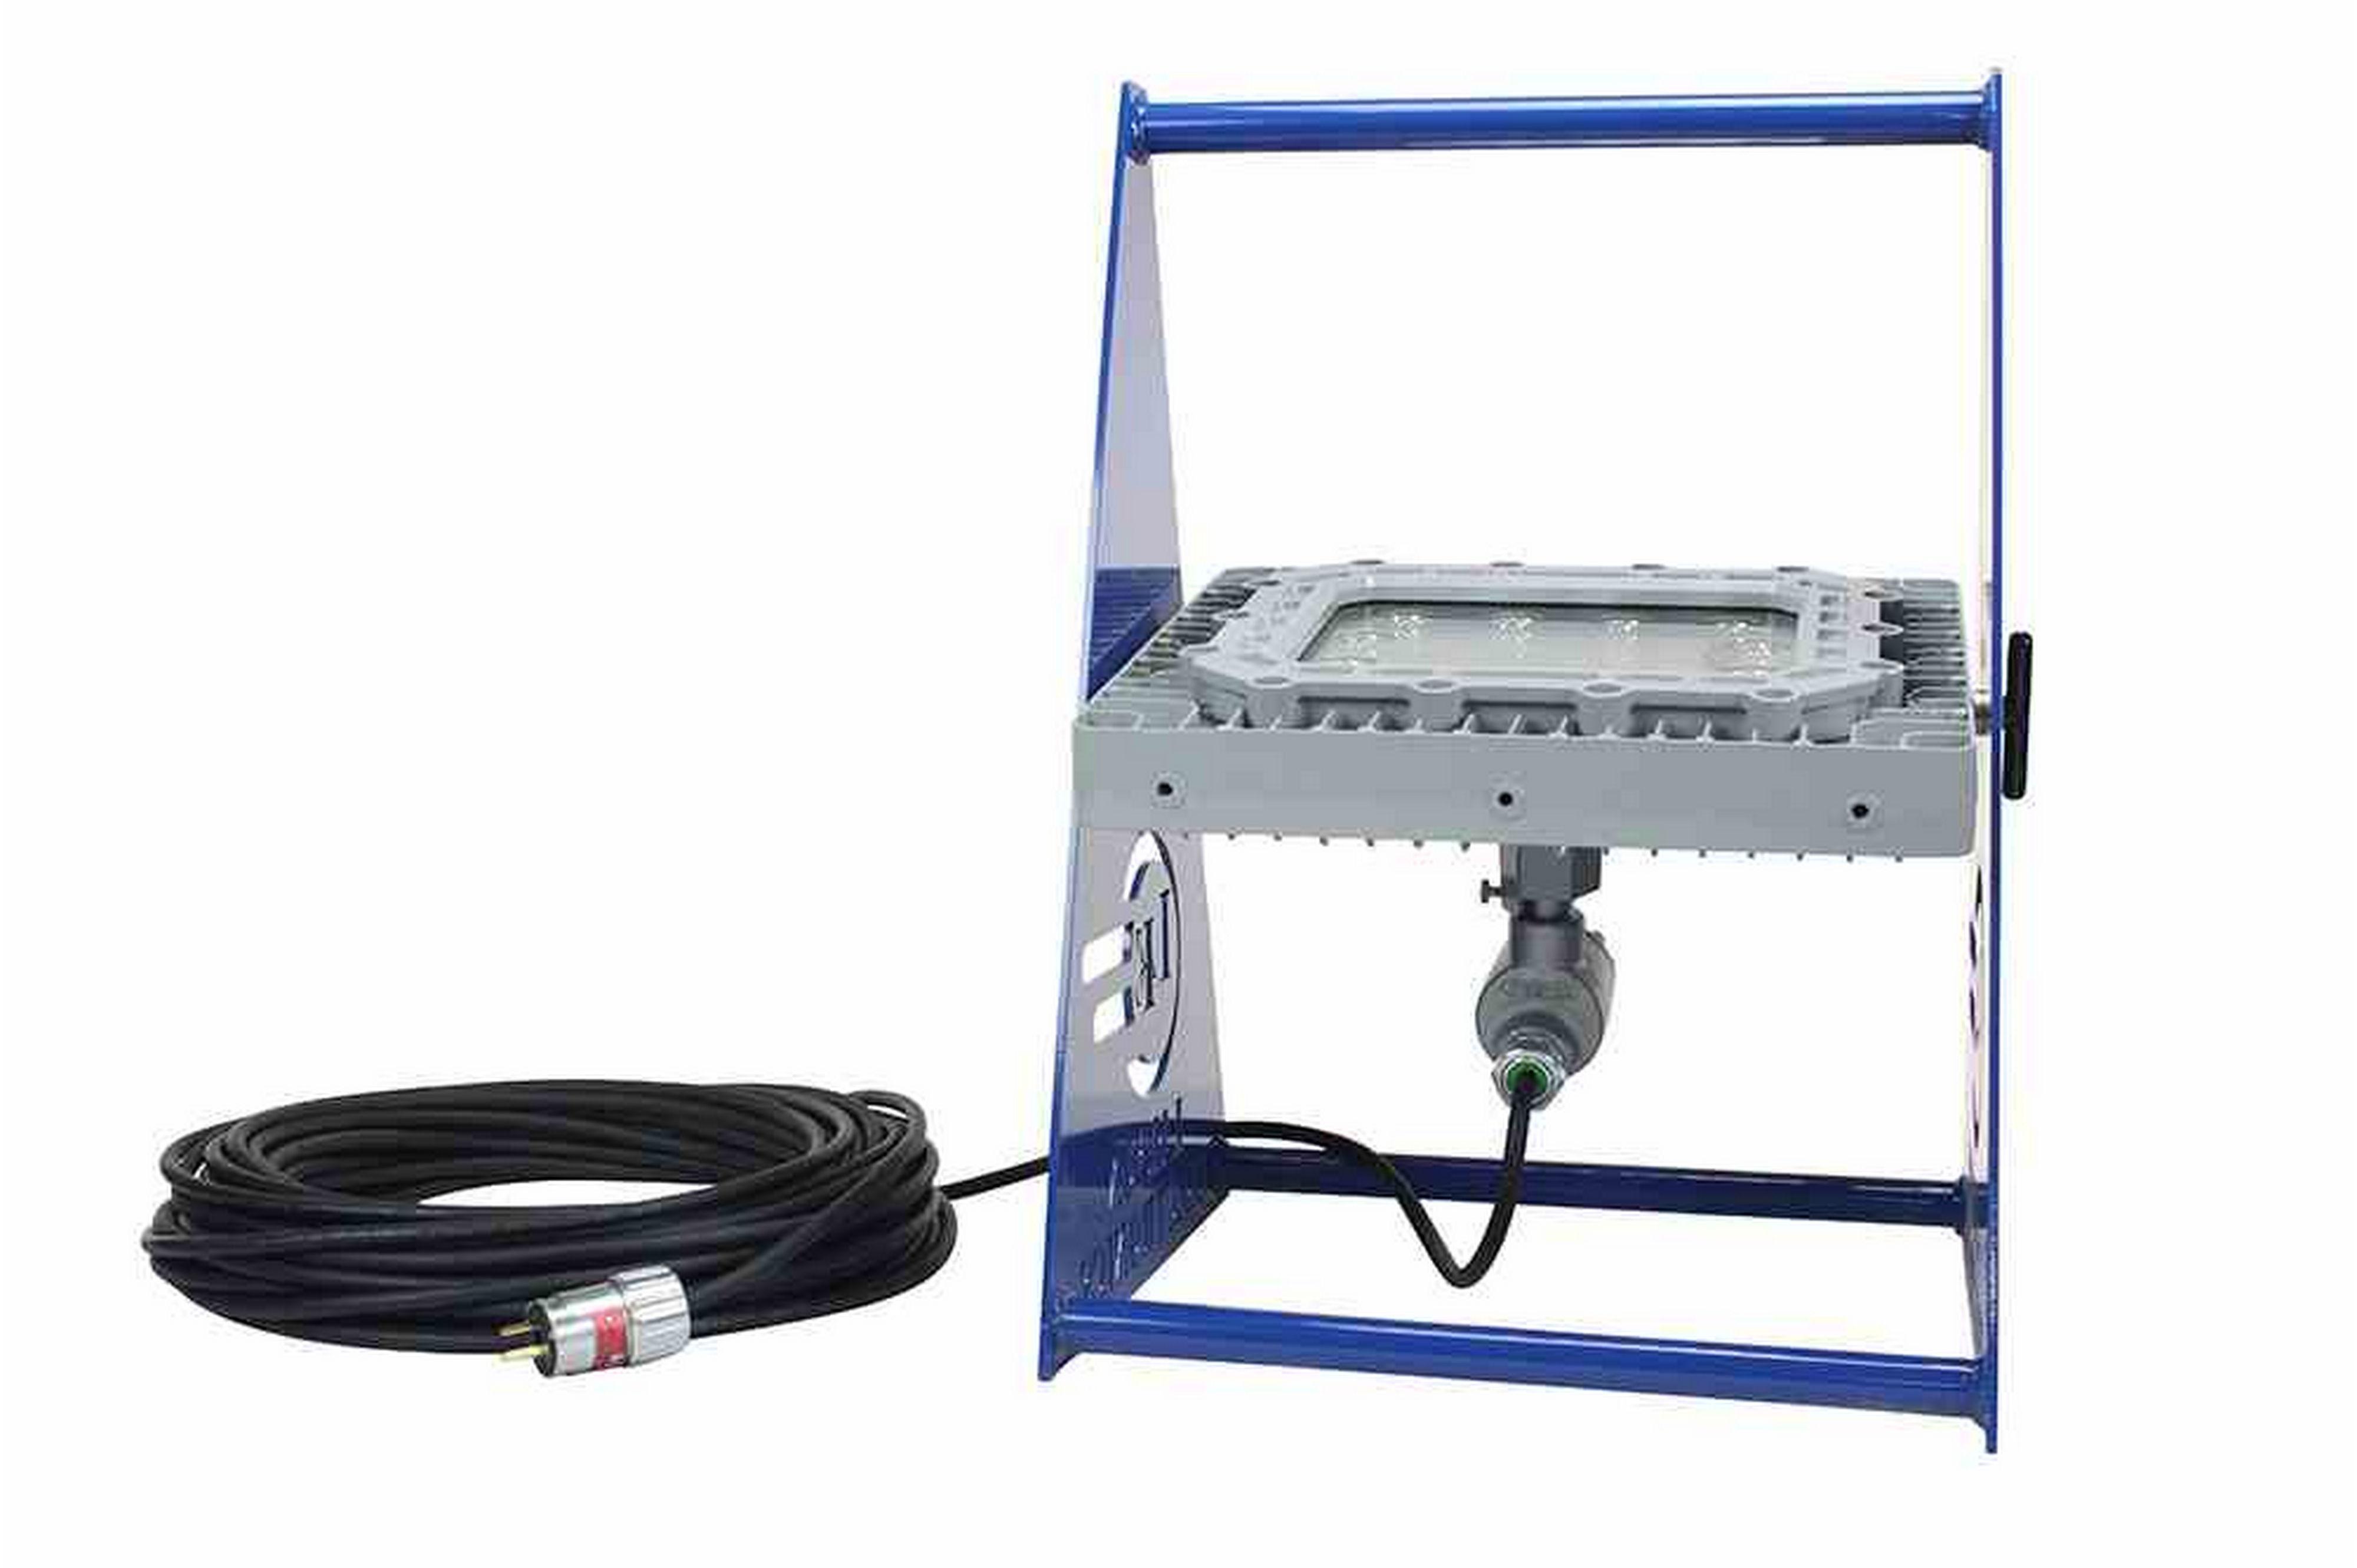 100w Explosion Proof Ultraviolet Portable Led Light Fixture C1d1 100 Watt Metal Halide Wiring Diagram Hi Res Image 3 Class 1 Division